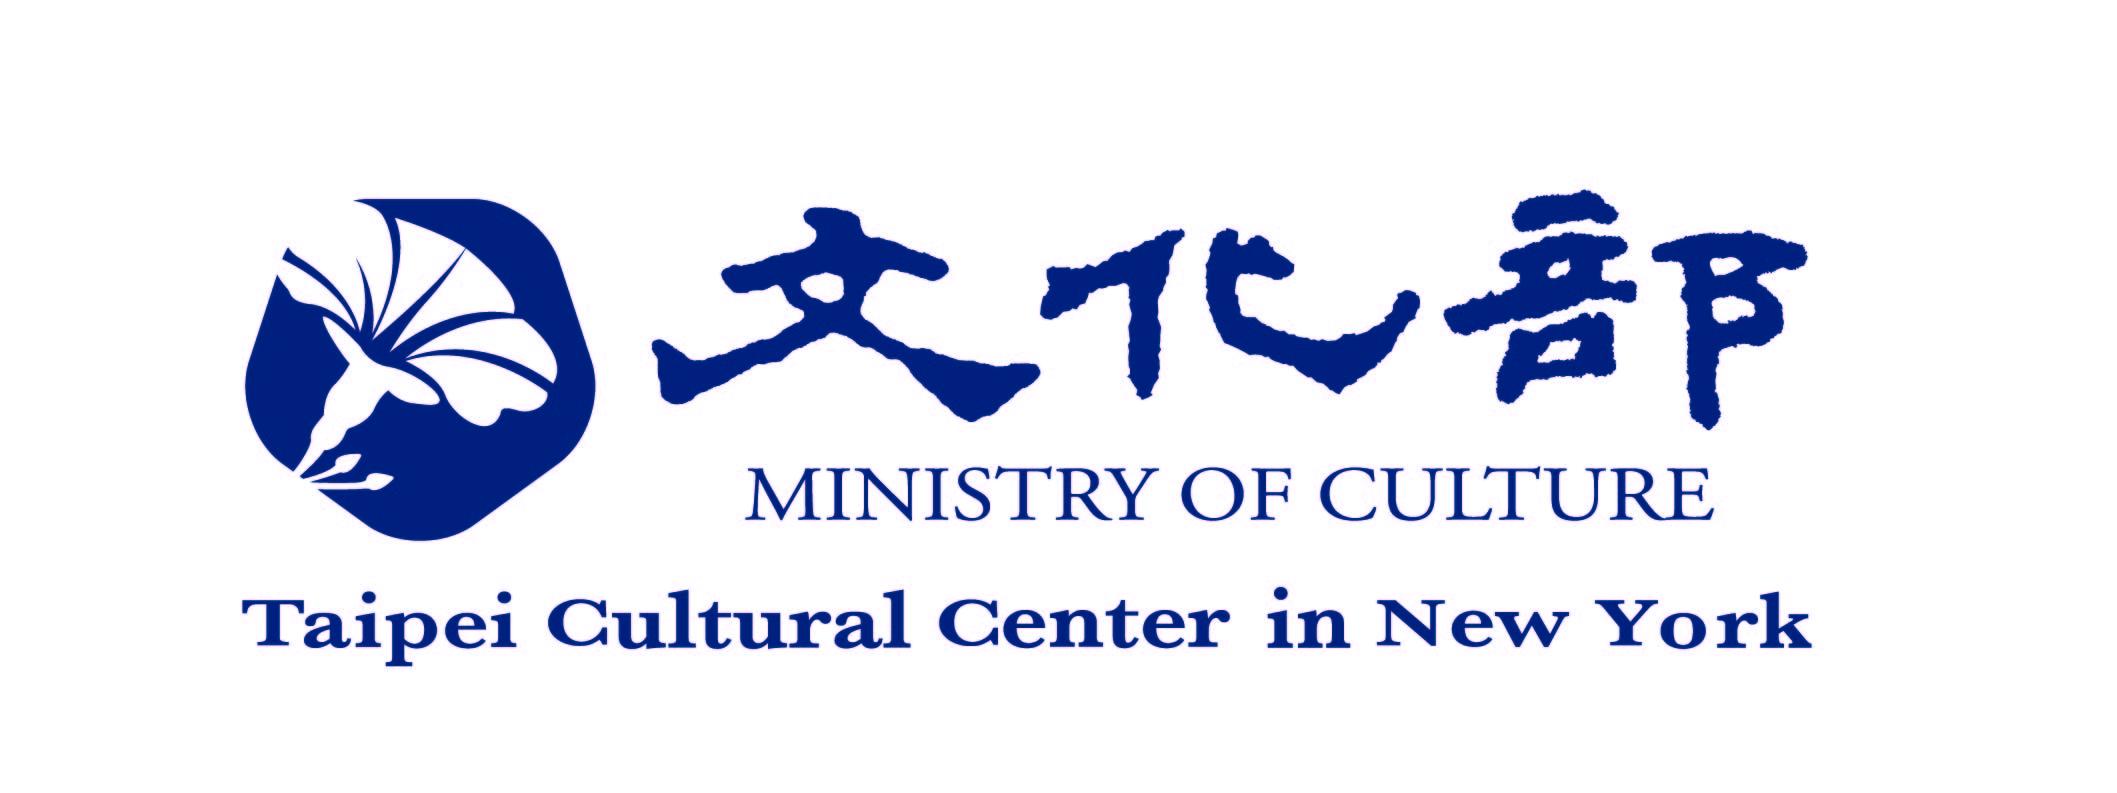 TPECC_Newest_Logo-JPEG.jpg